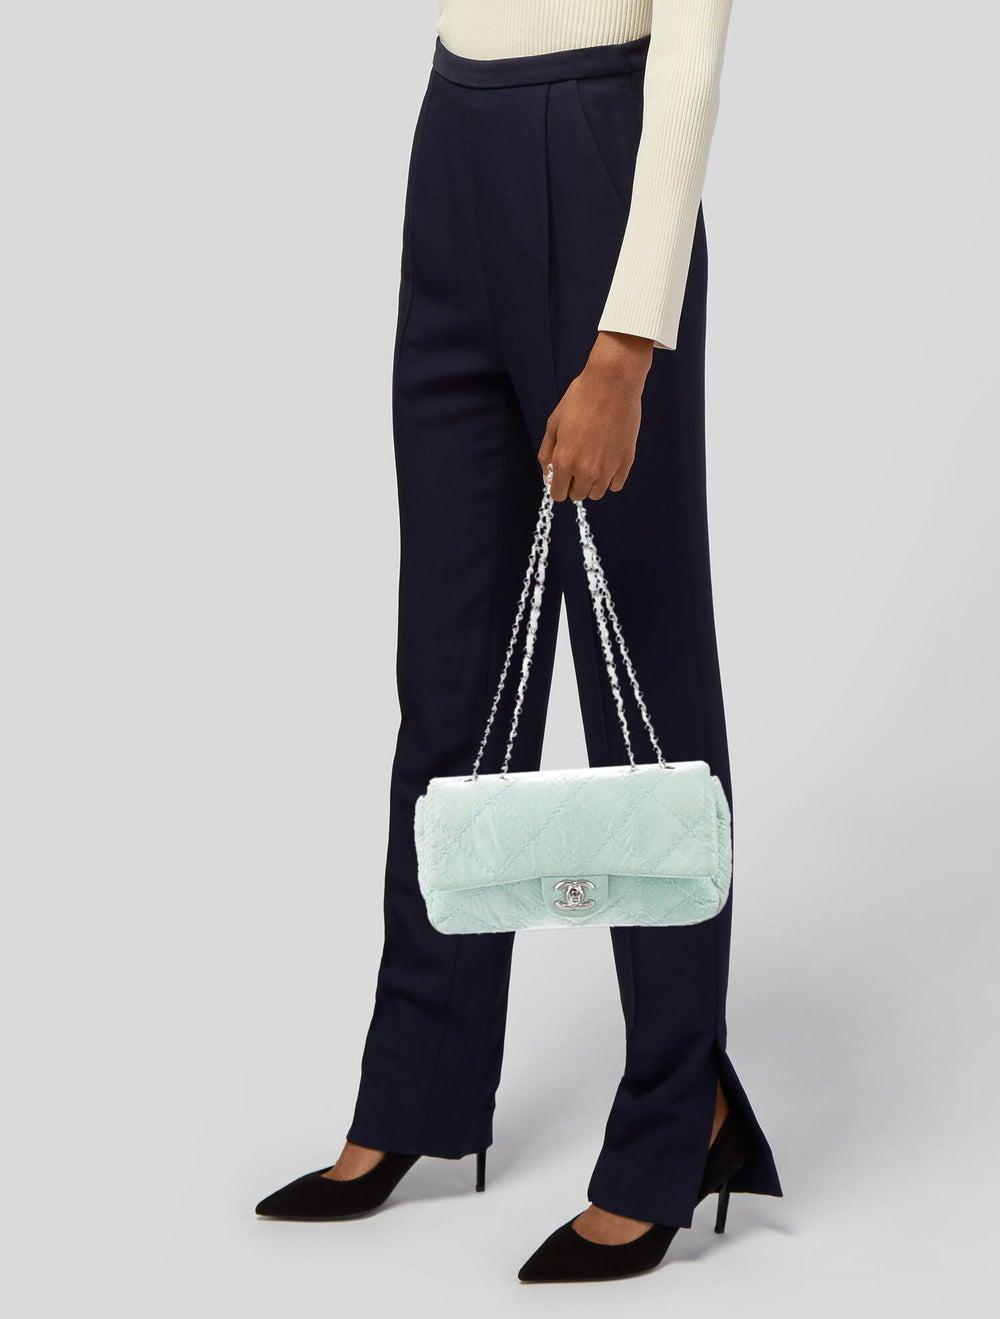 Chanel Python Ultimate Stitch Flap Bag Blue - image 2